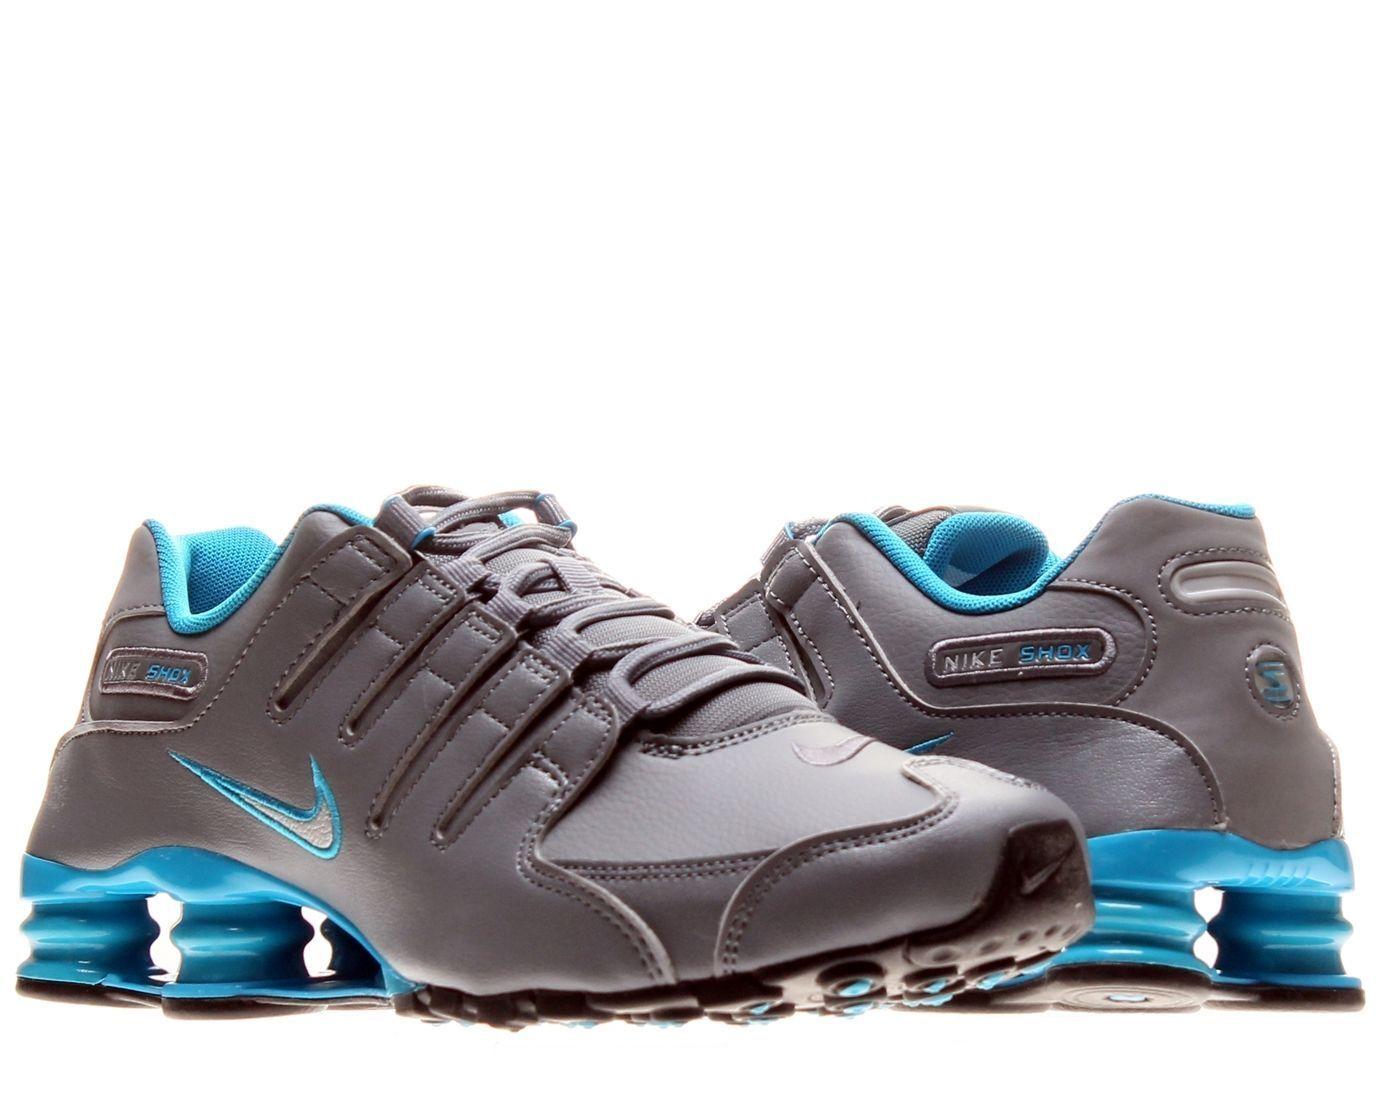 Nike Shox NZ Shoe Mens size 8 378341-004 Cool Grey/Mtllc Silver/Bl Lgn